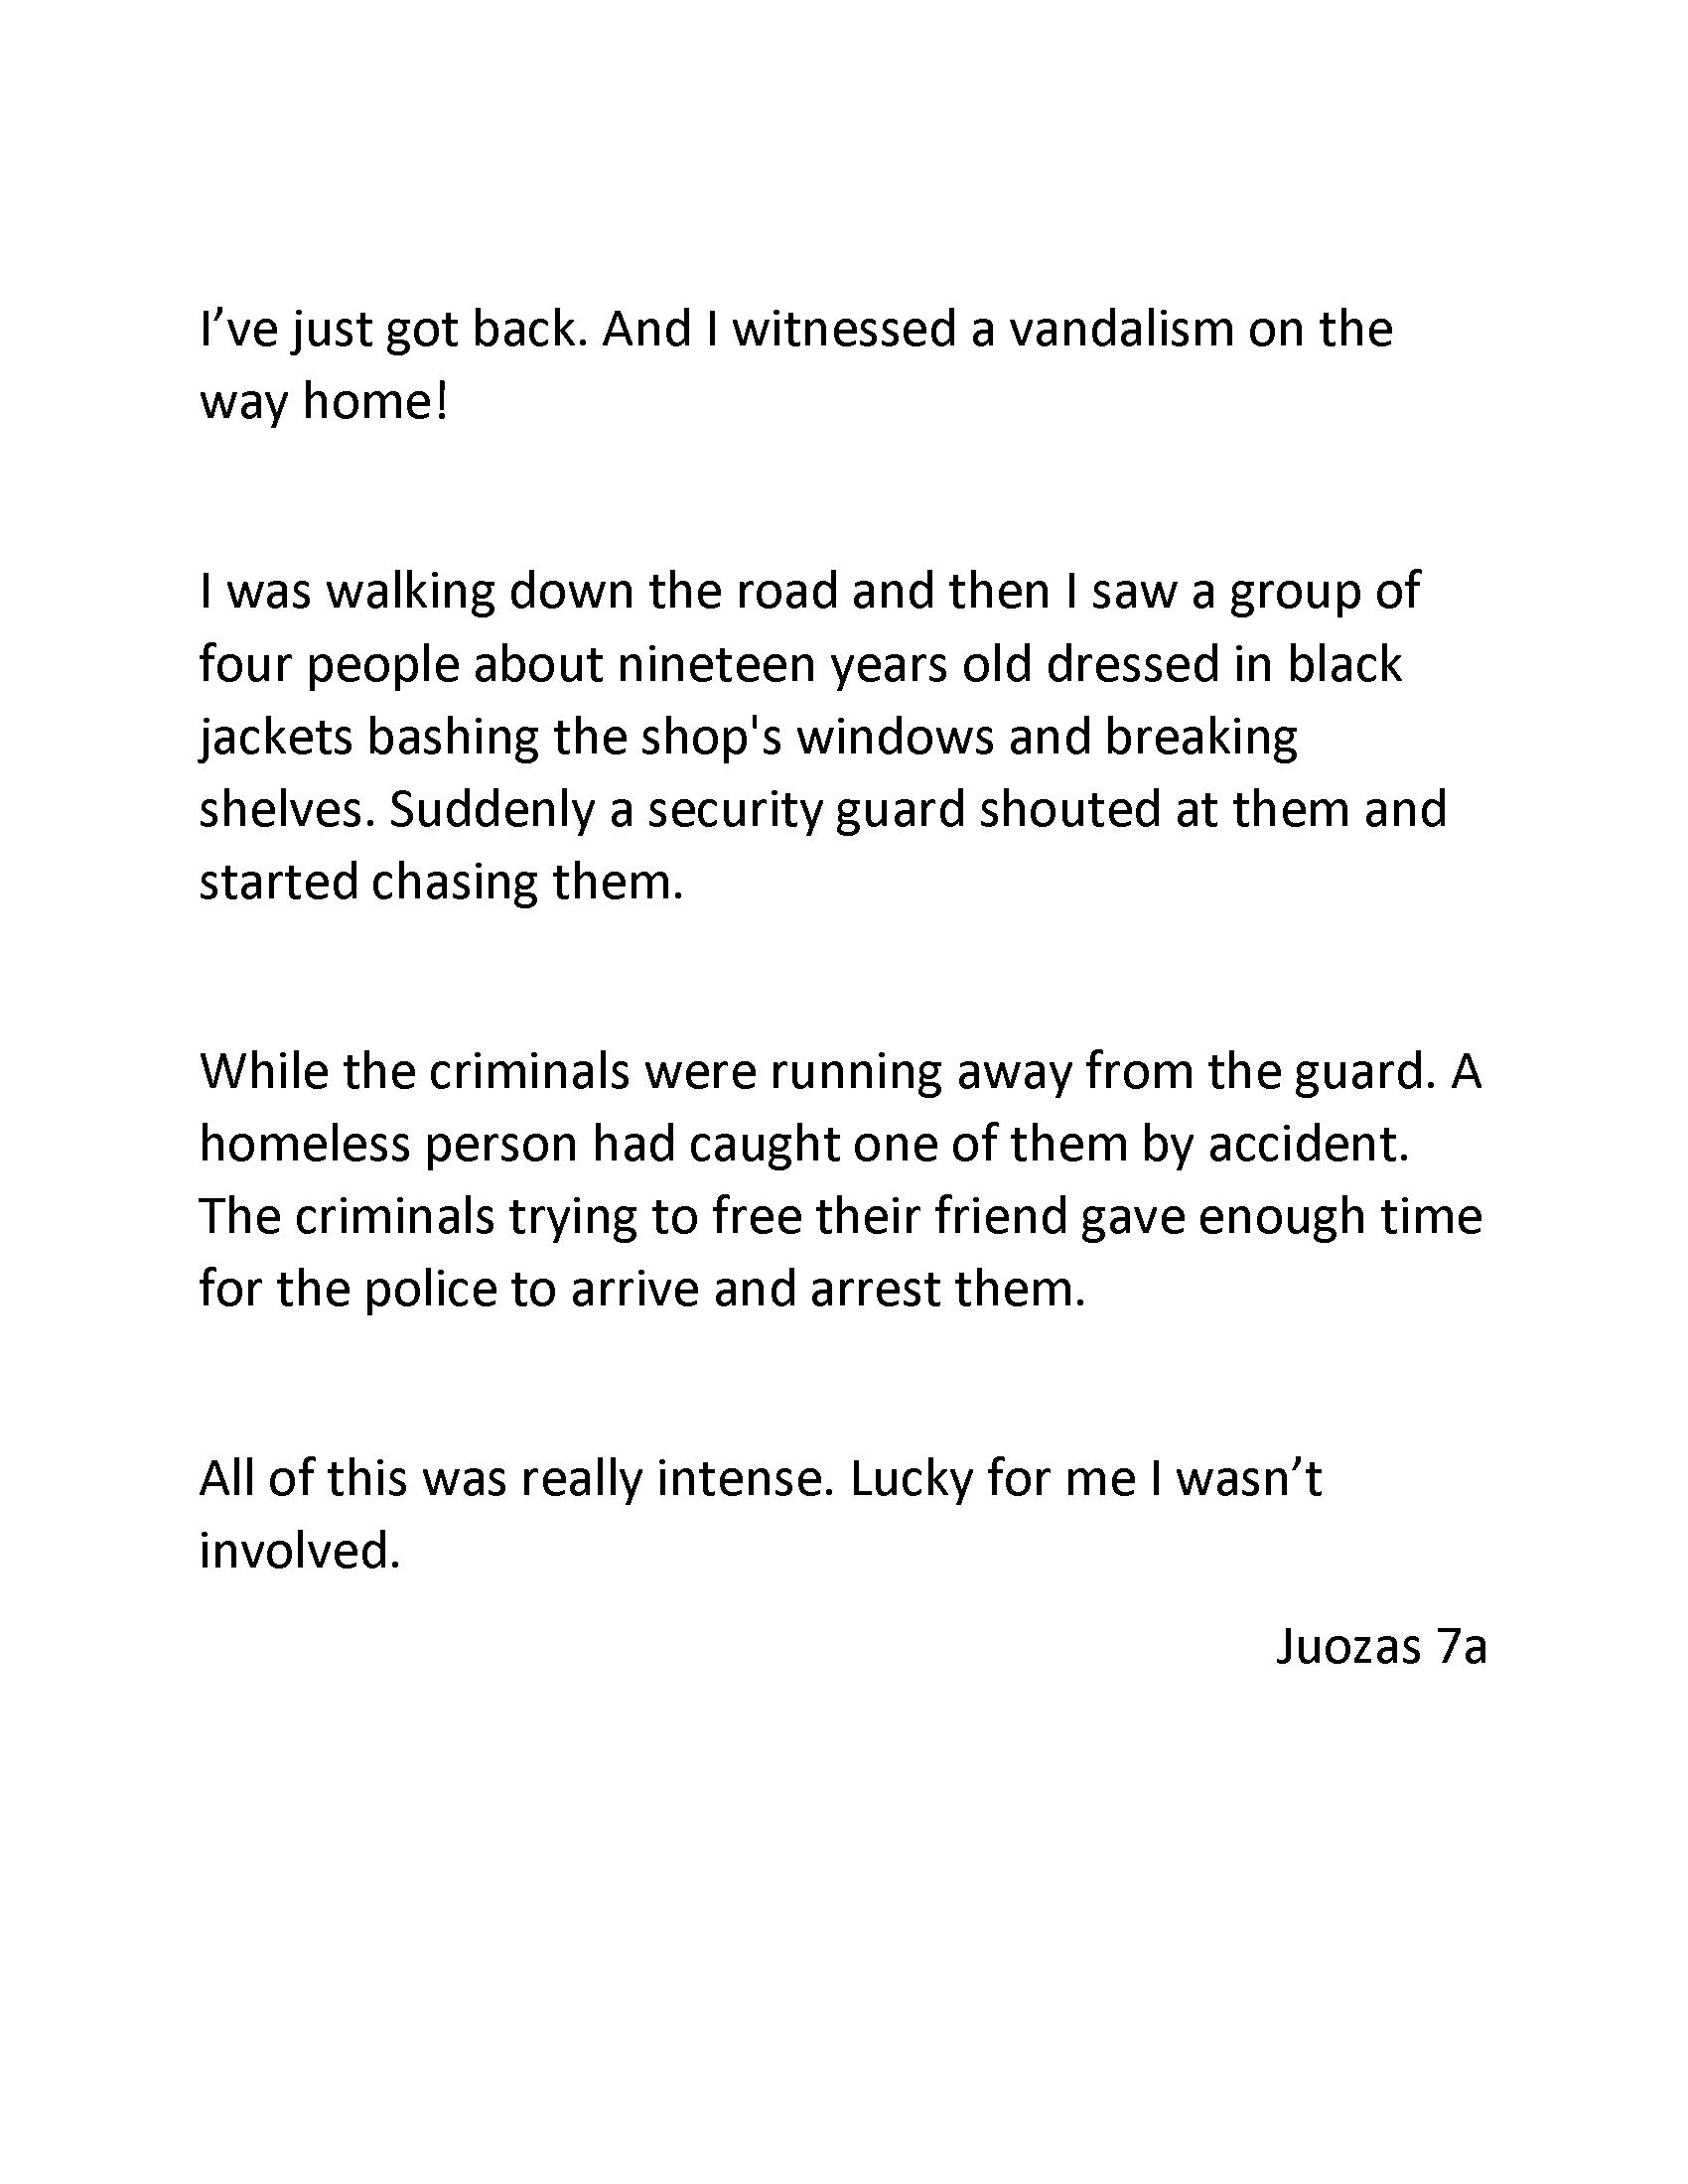 Juozas-7a-informal-letter